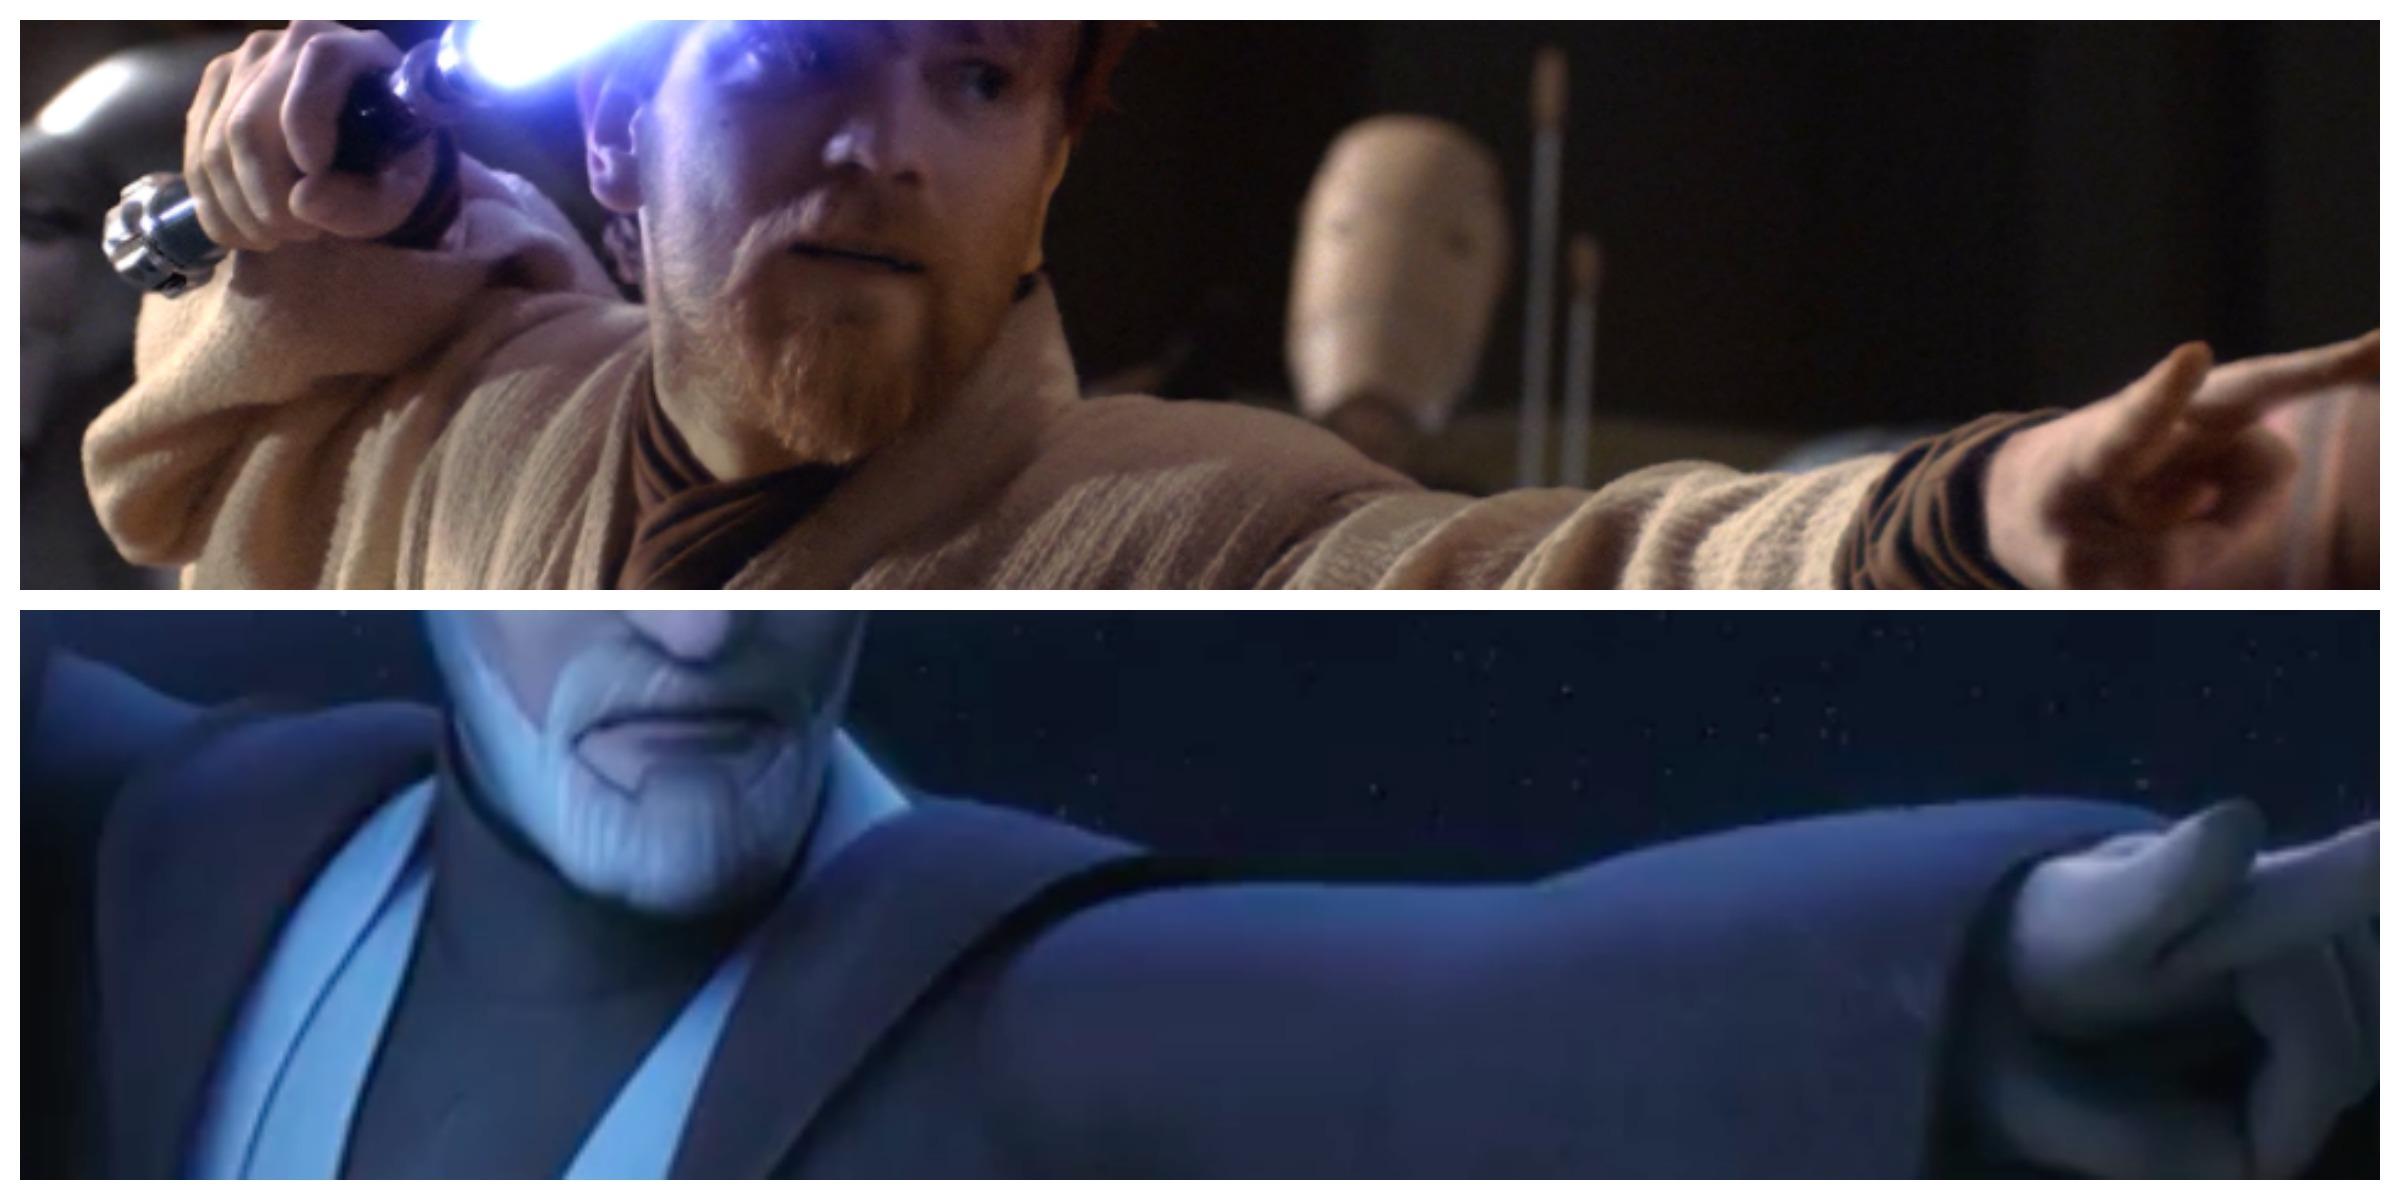 TOP: Obi-Wan in EP III BOTTOM: Obi-Wan in the new trailer